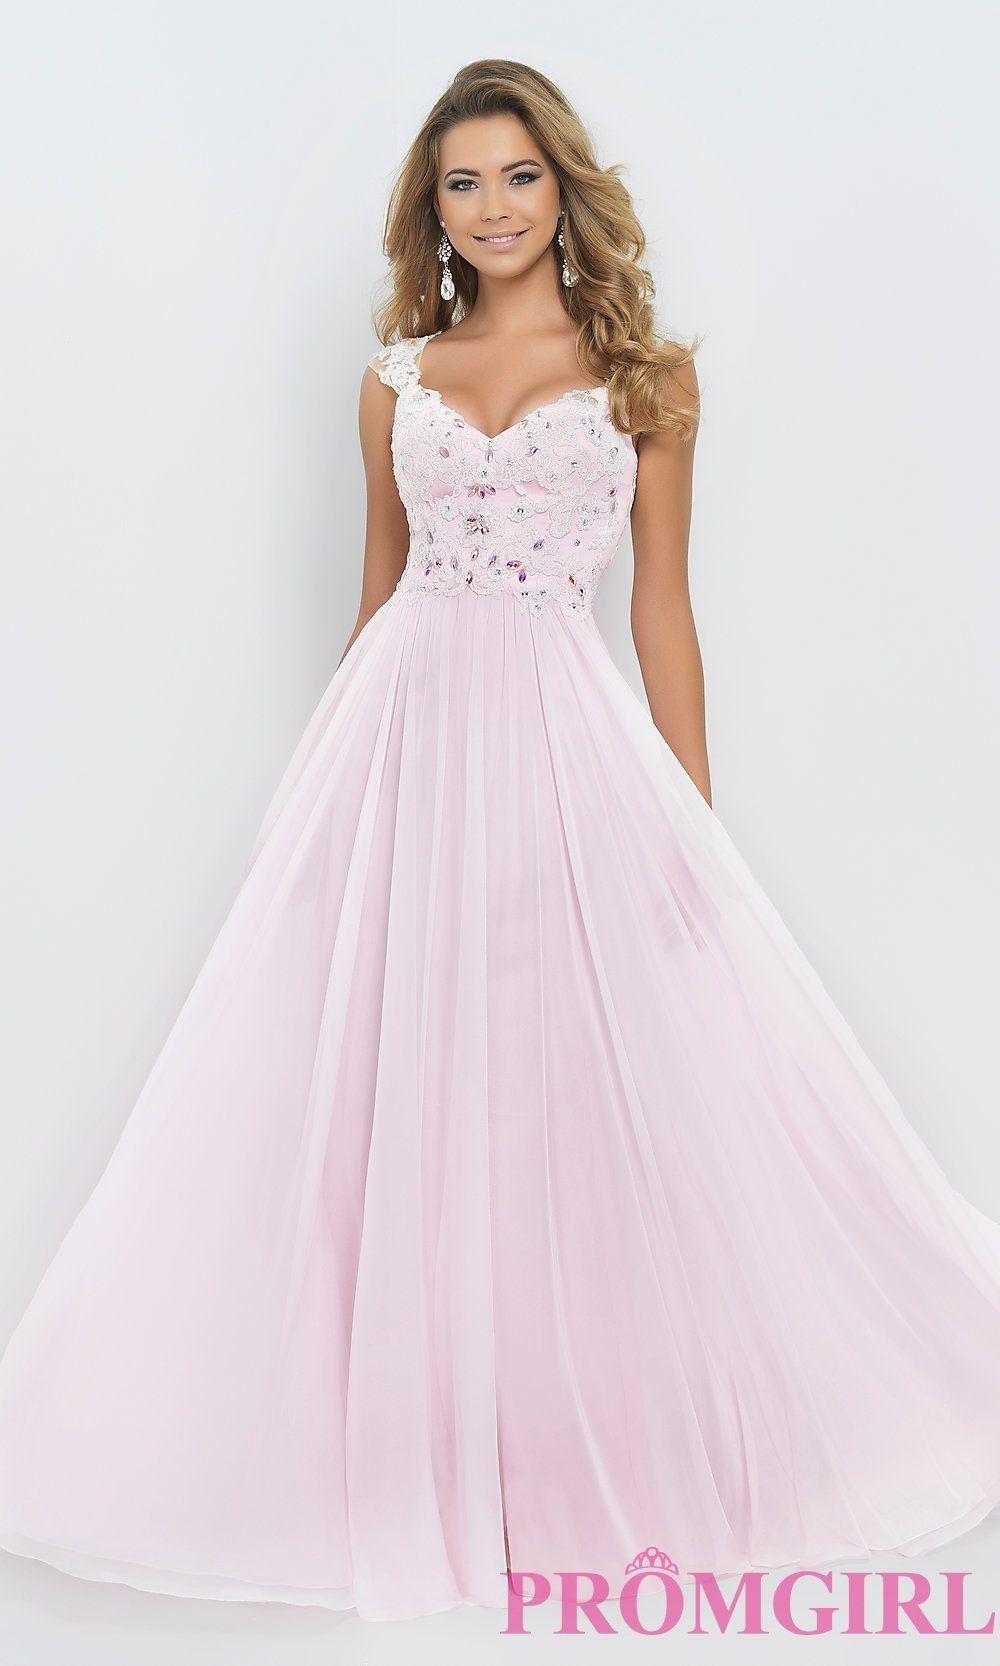 Light pink prom dress pdresseslightpinkprom